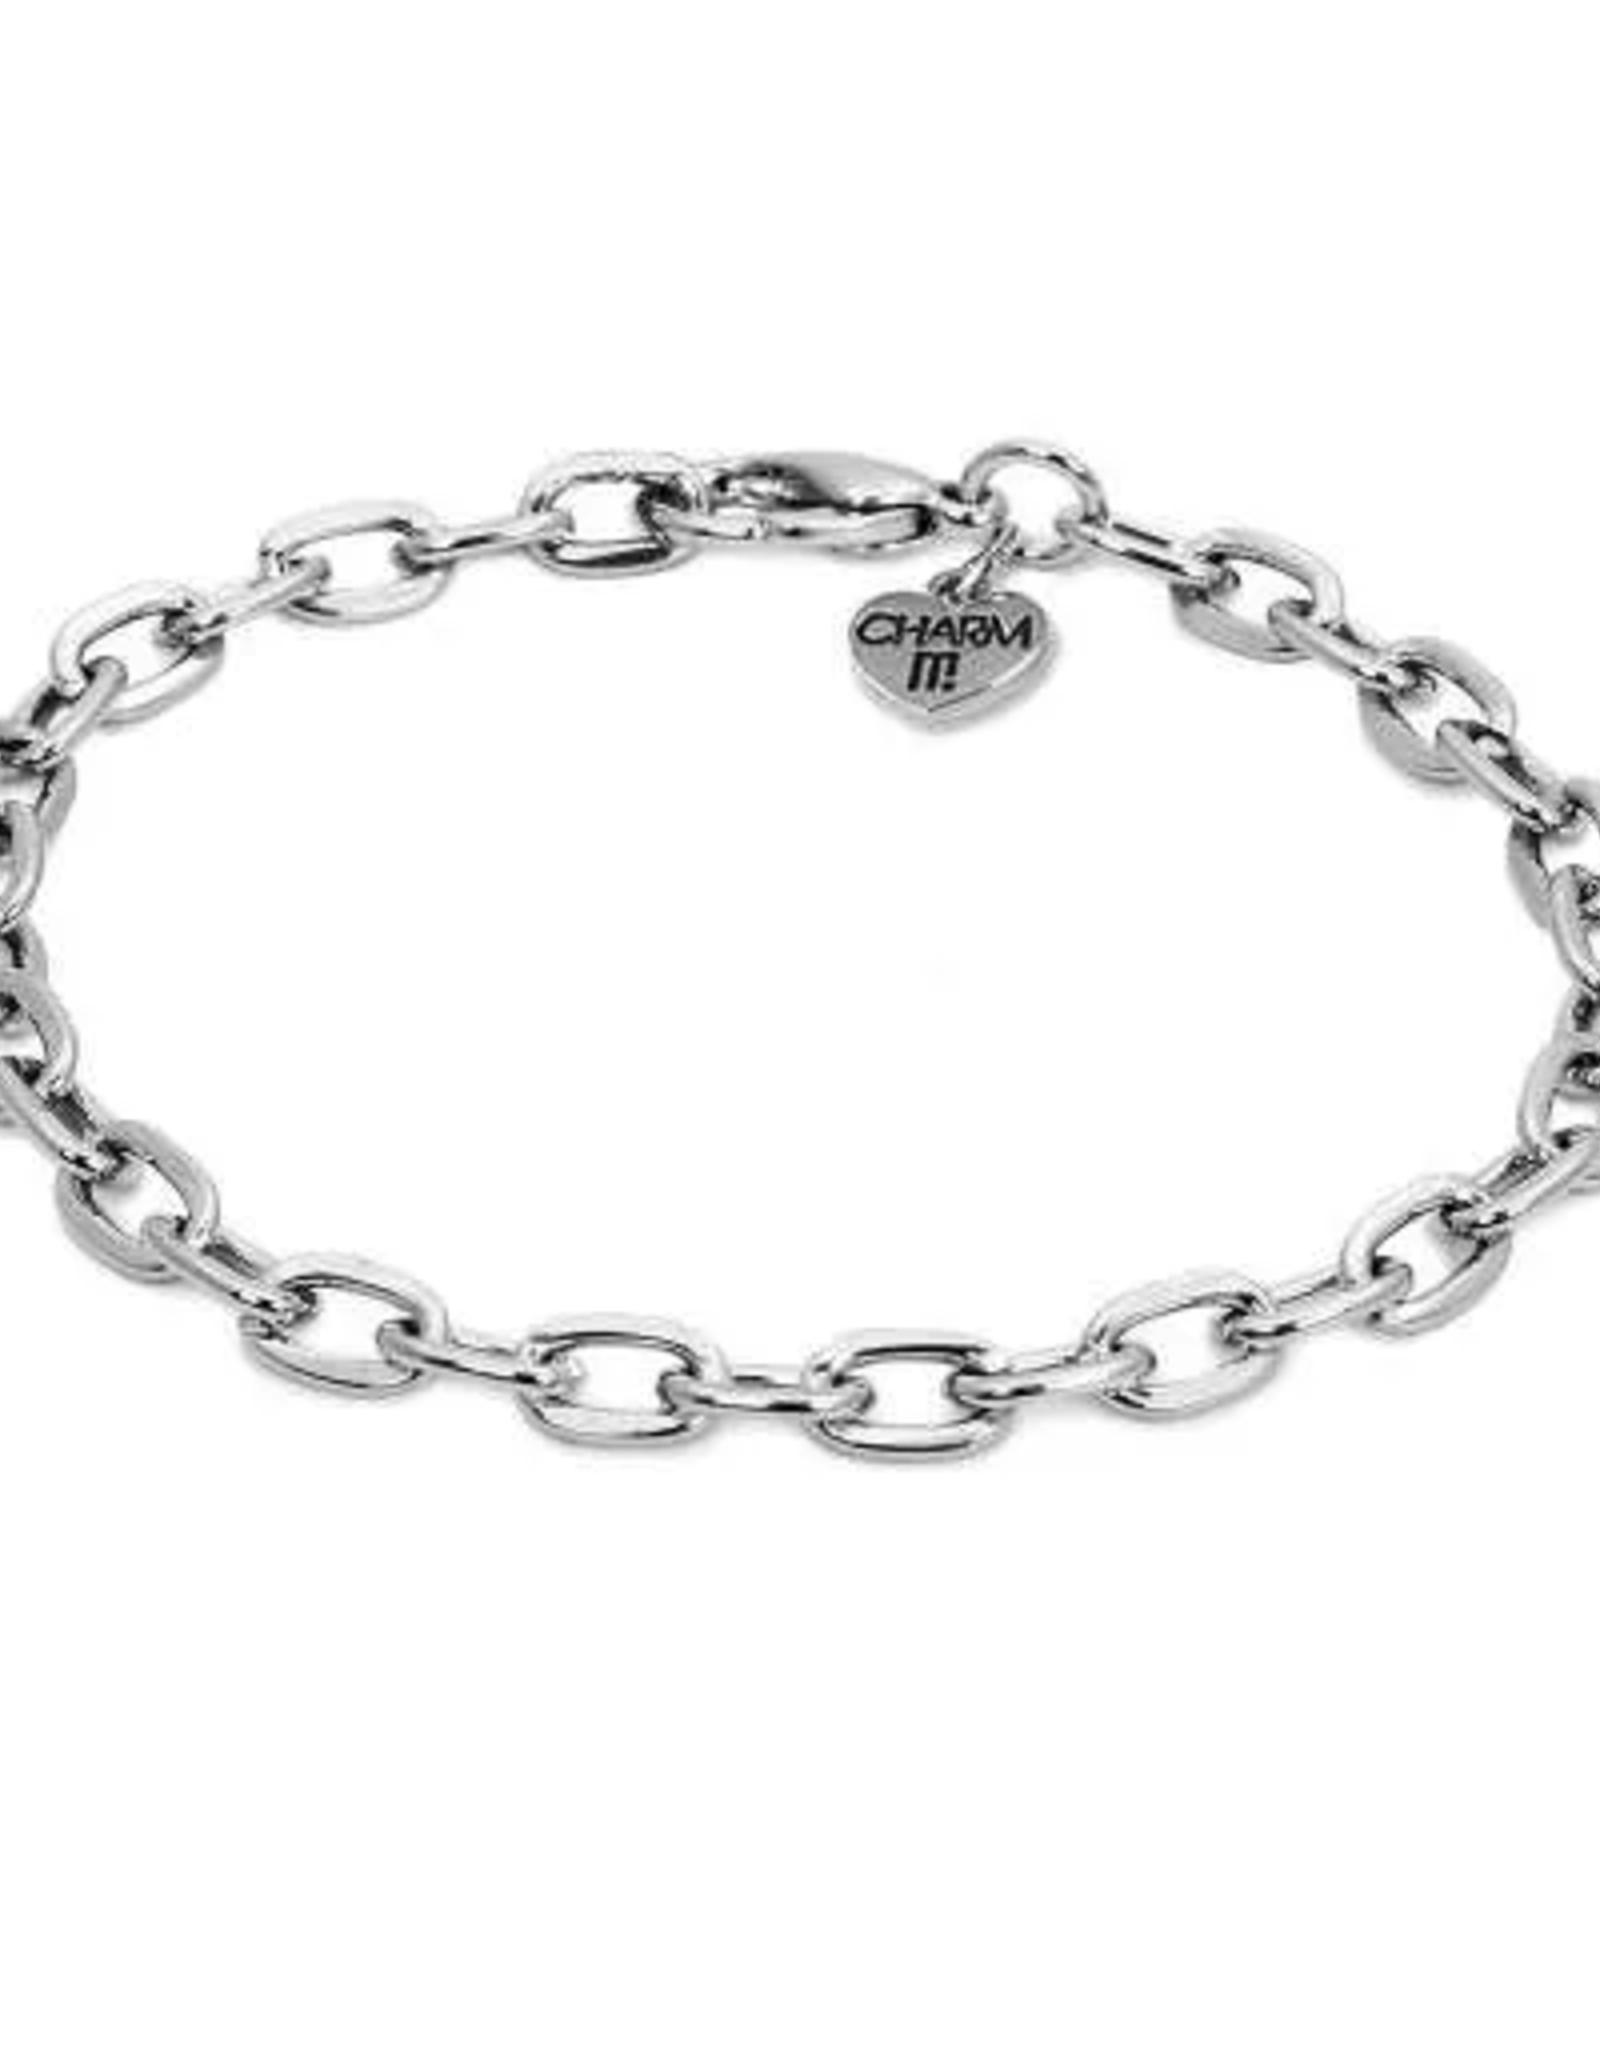 CHARM IT! Chain Bracelet